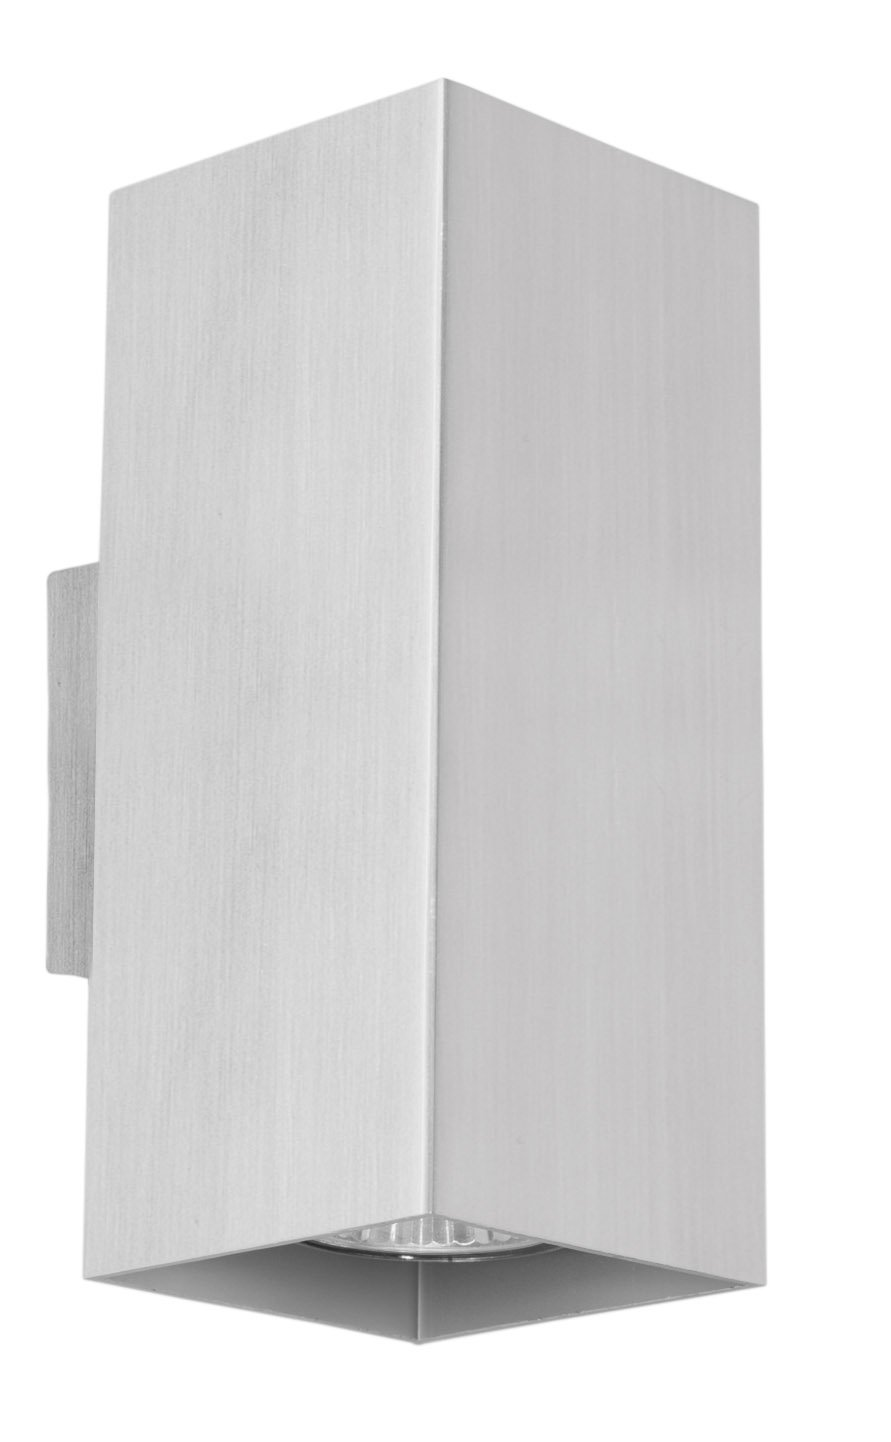 Eglo 87019A Madras Wall or Ceiling Light, Aluminum